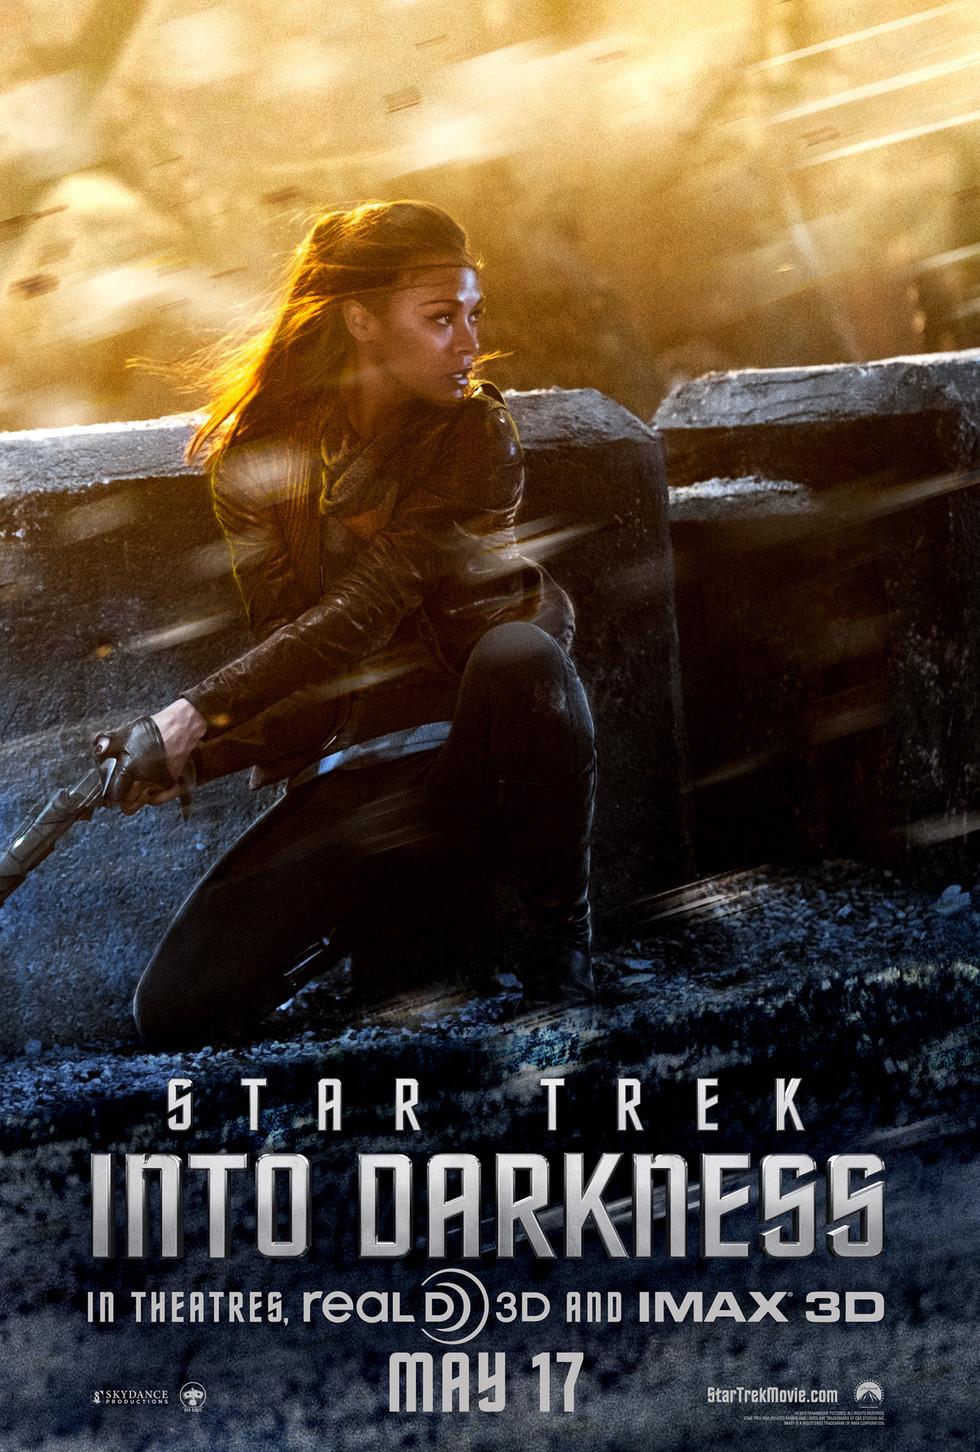 Star Trek Into Darkness - Movie Poster #2 (Large)